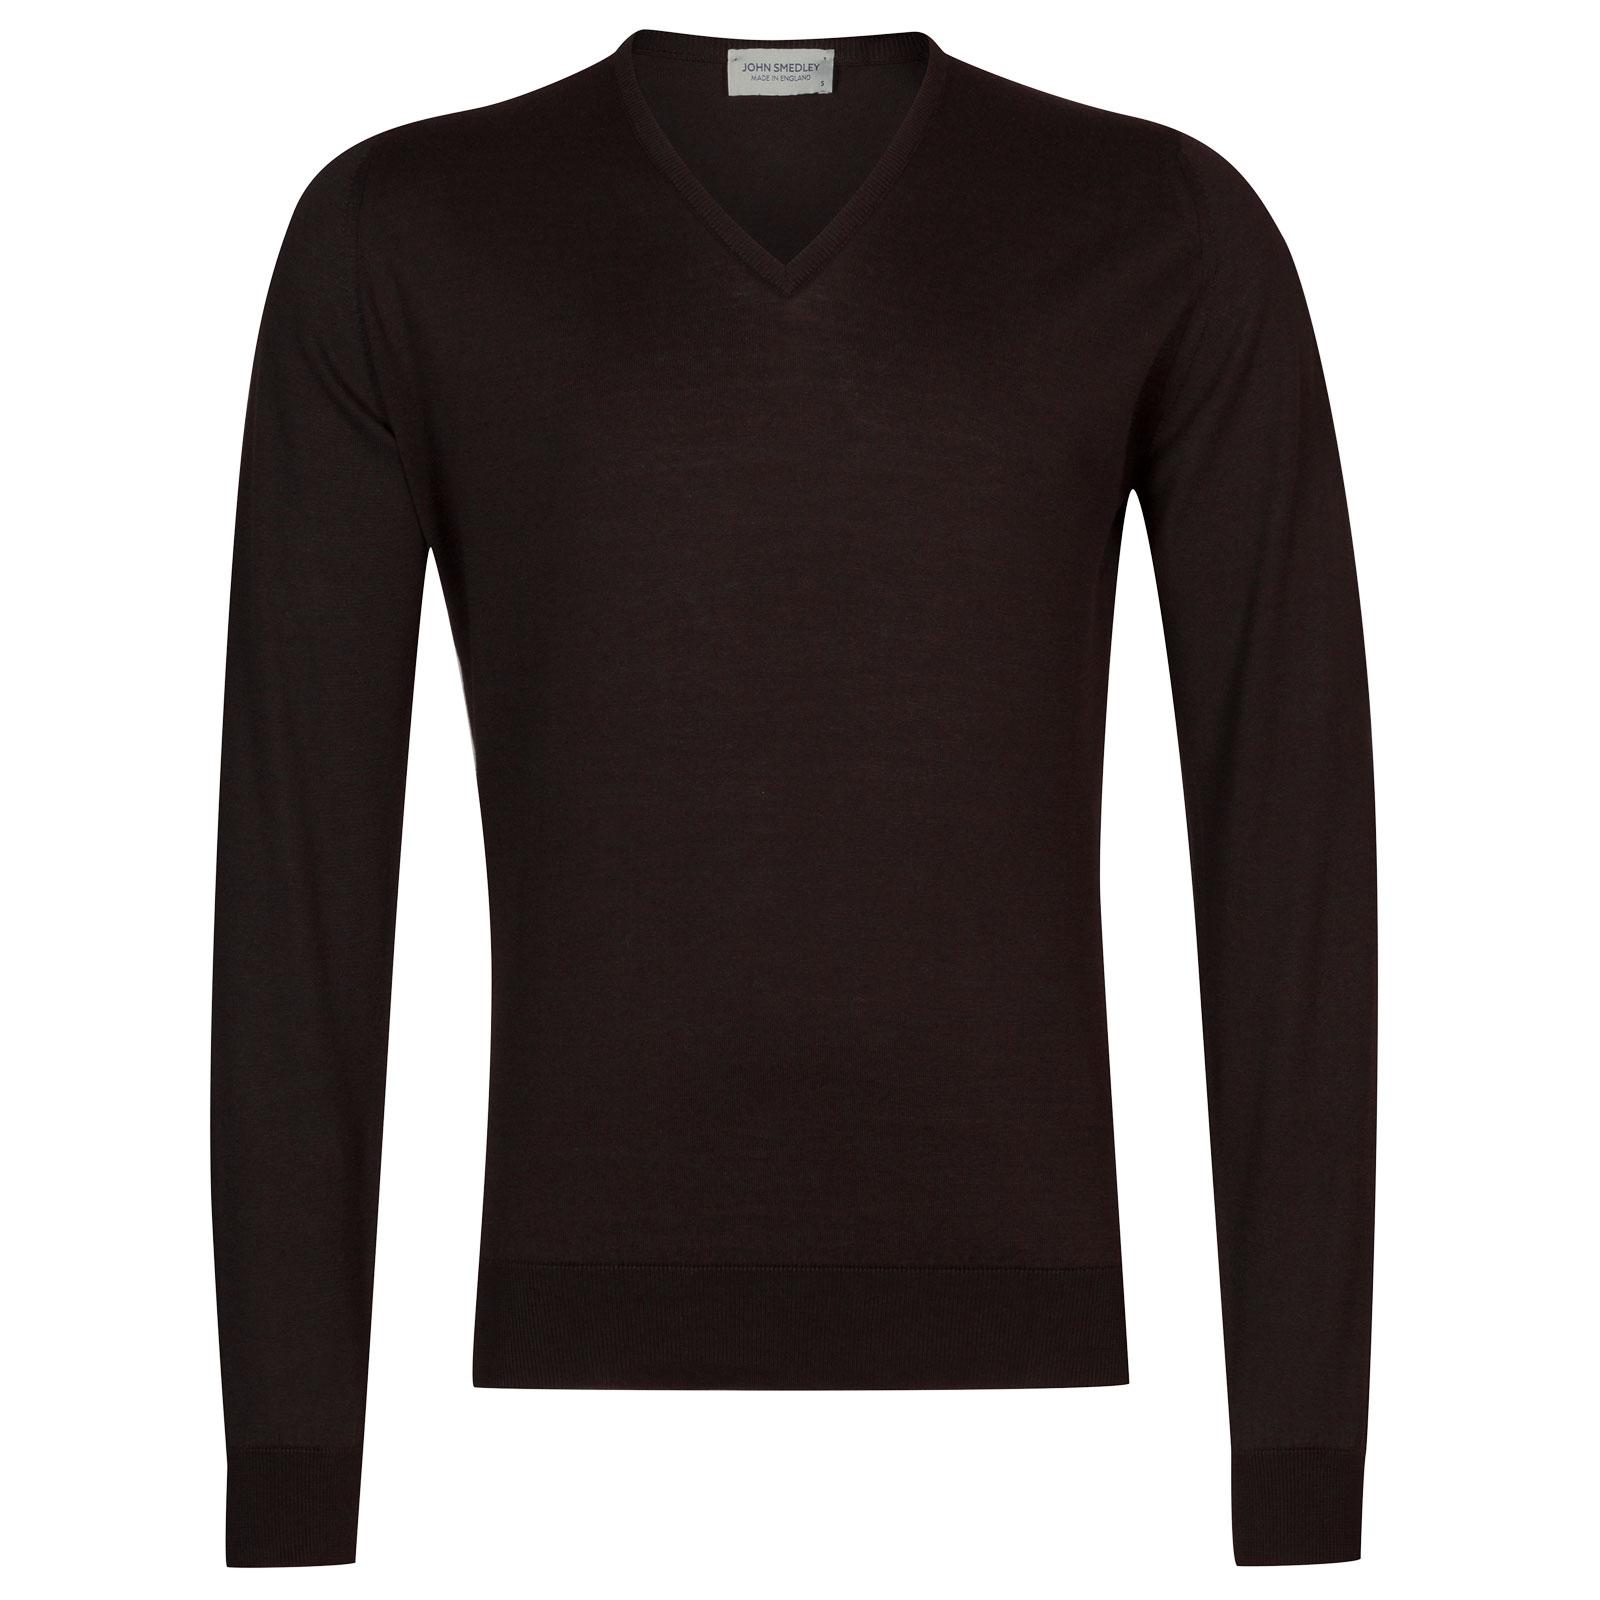 woburn-dark-leather-M